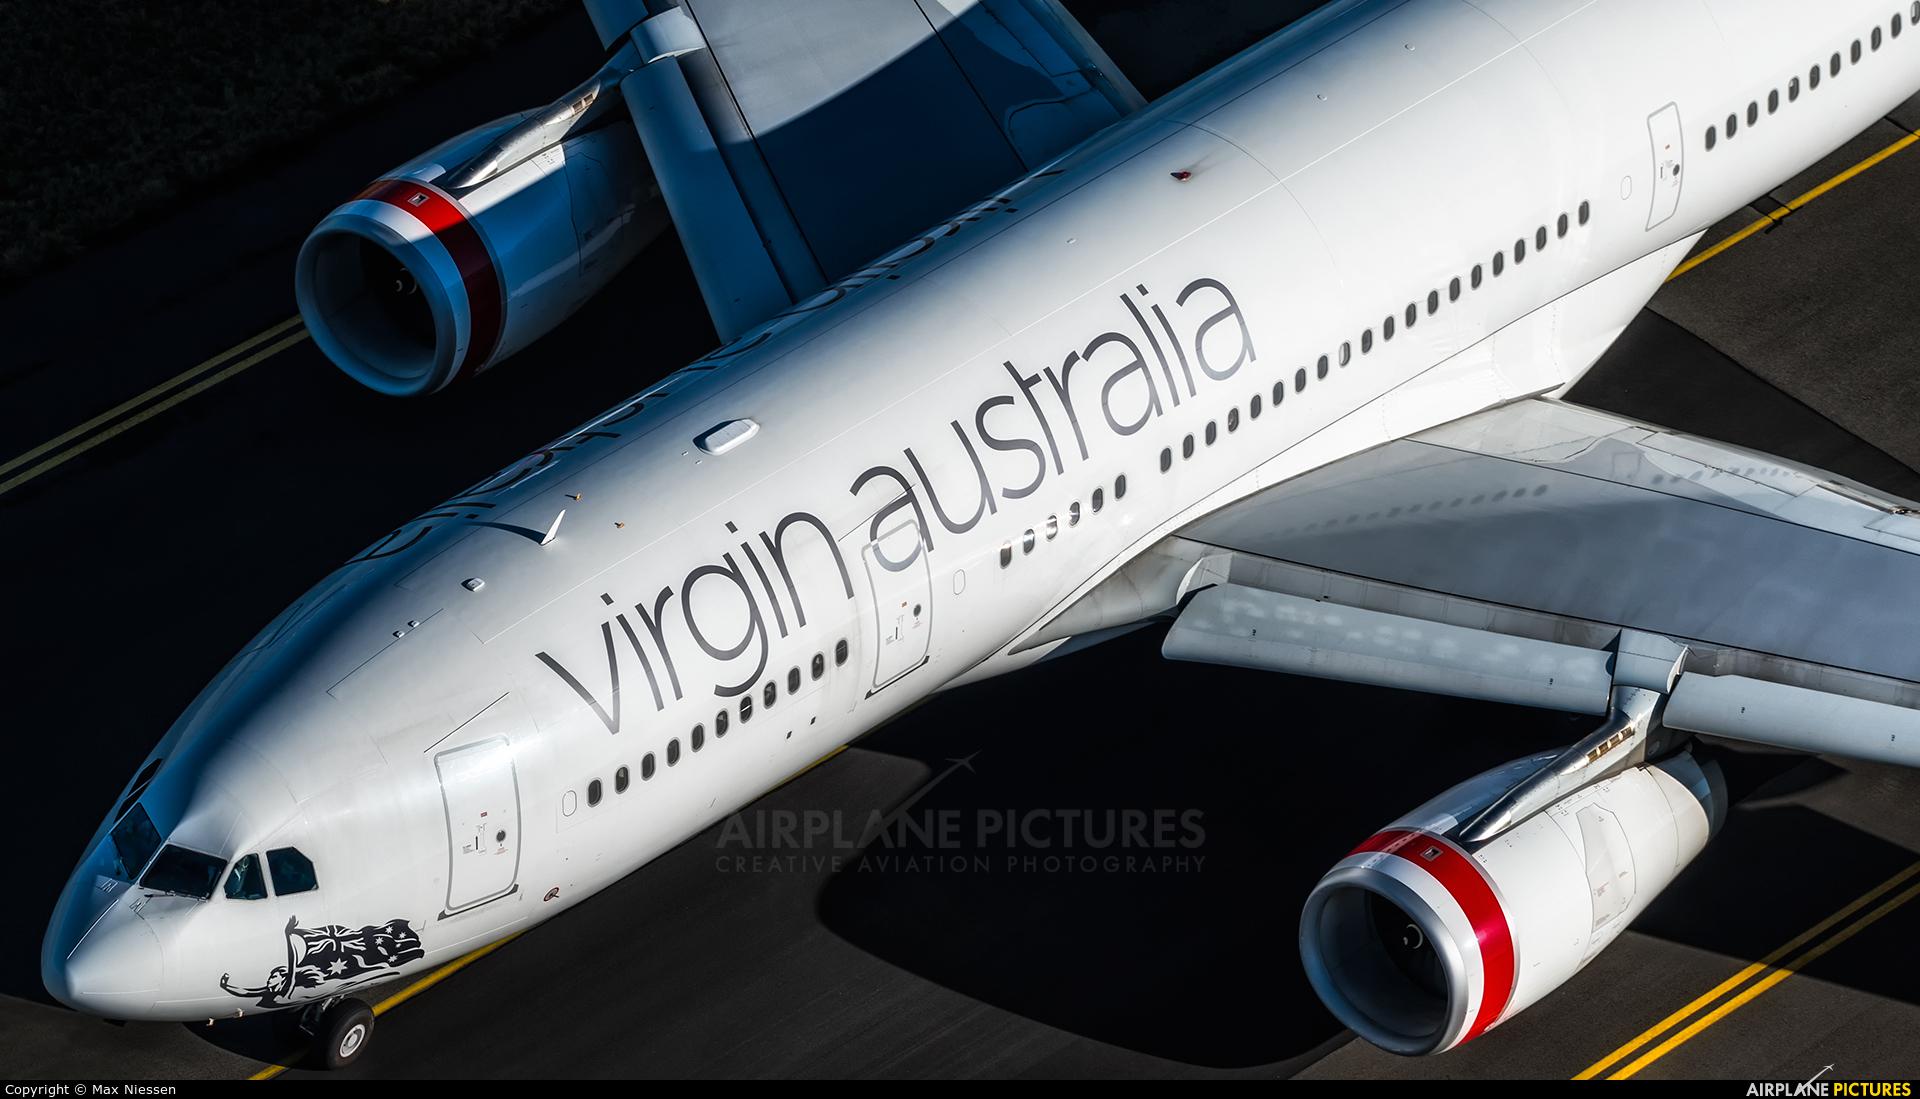 Virgin Australia VH-XFG aircraft at Sydney - Kingsford Smith Intl, NSW